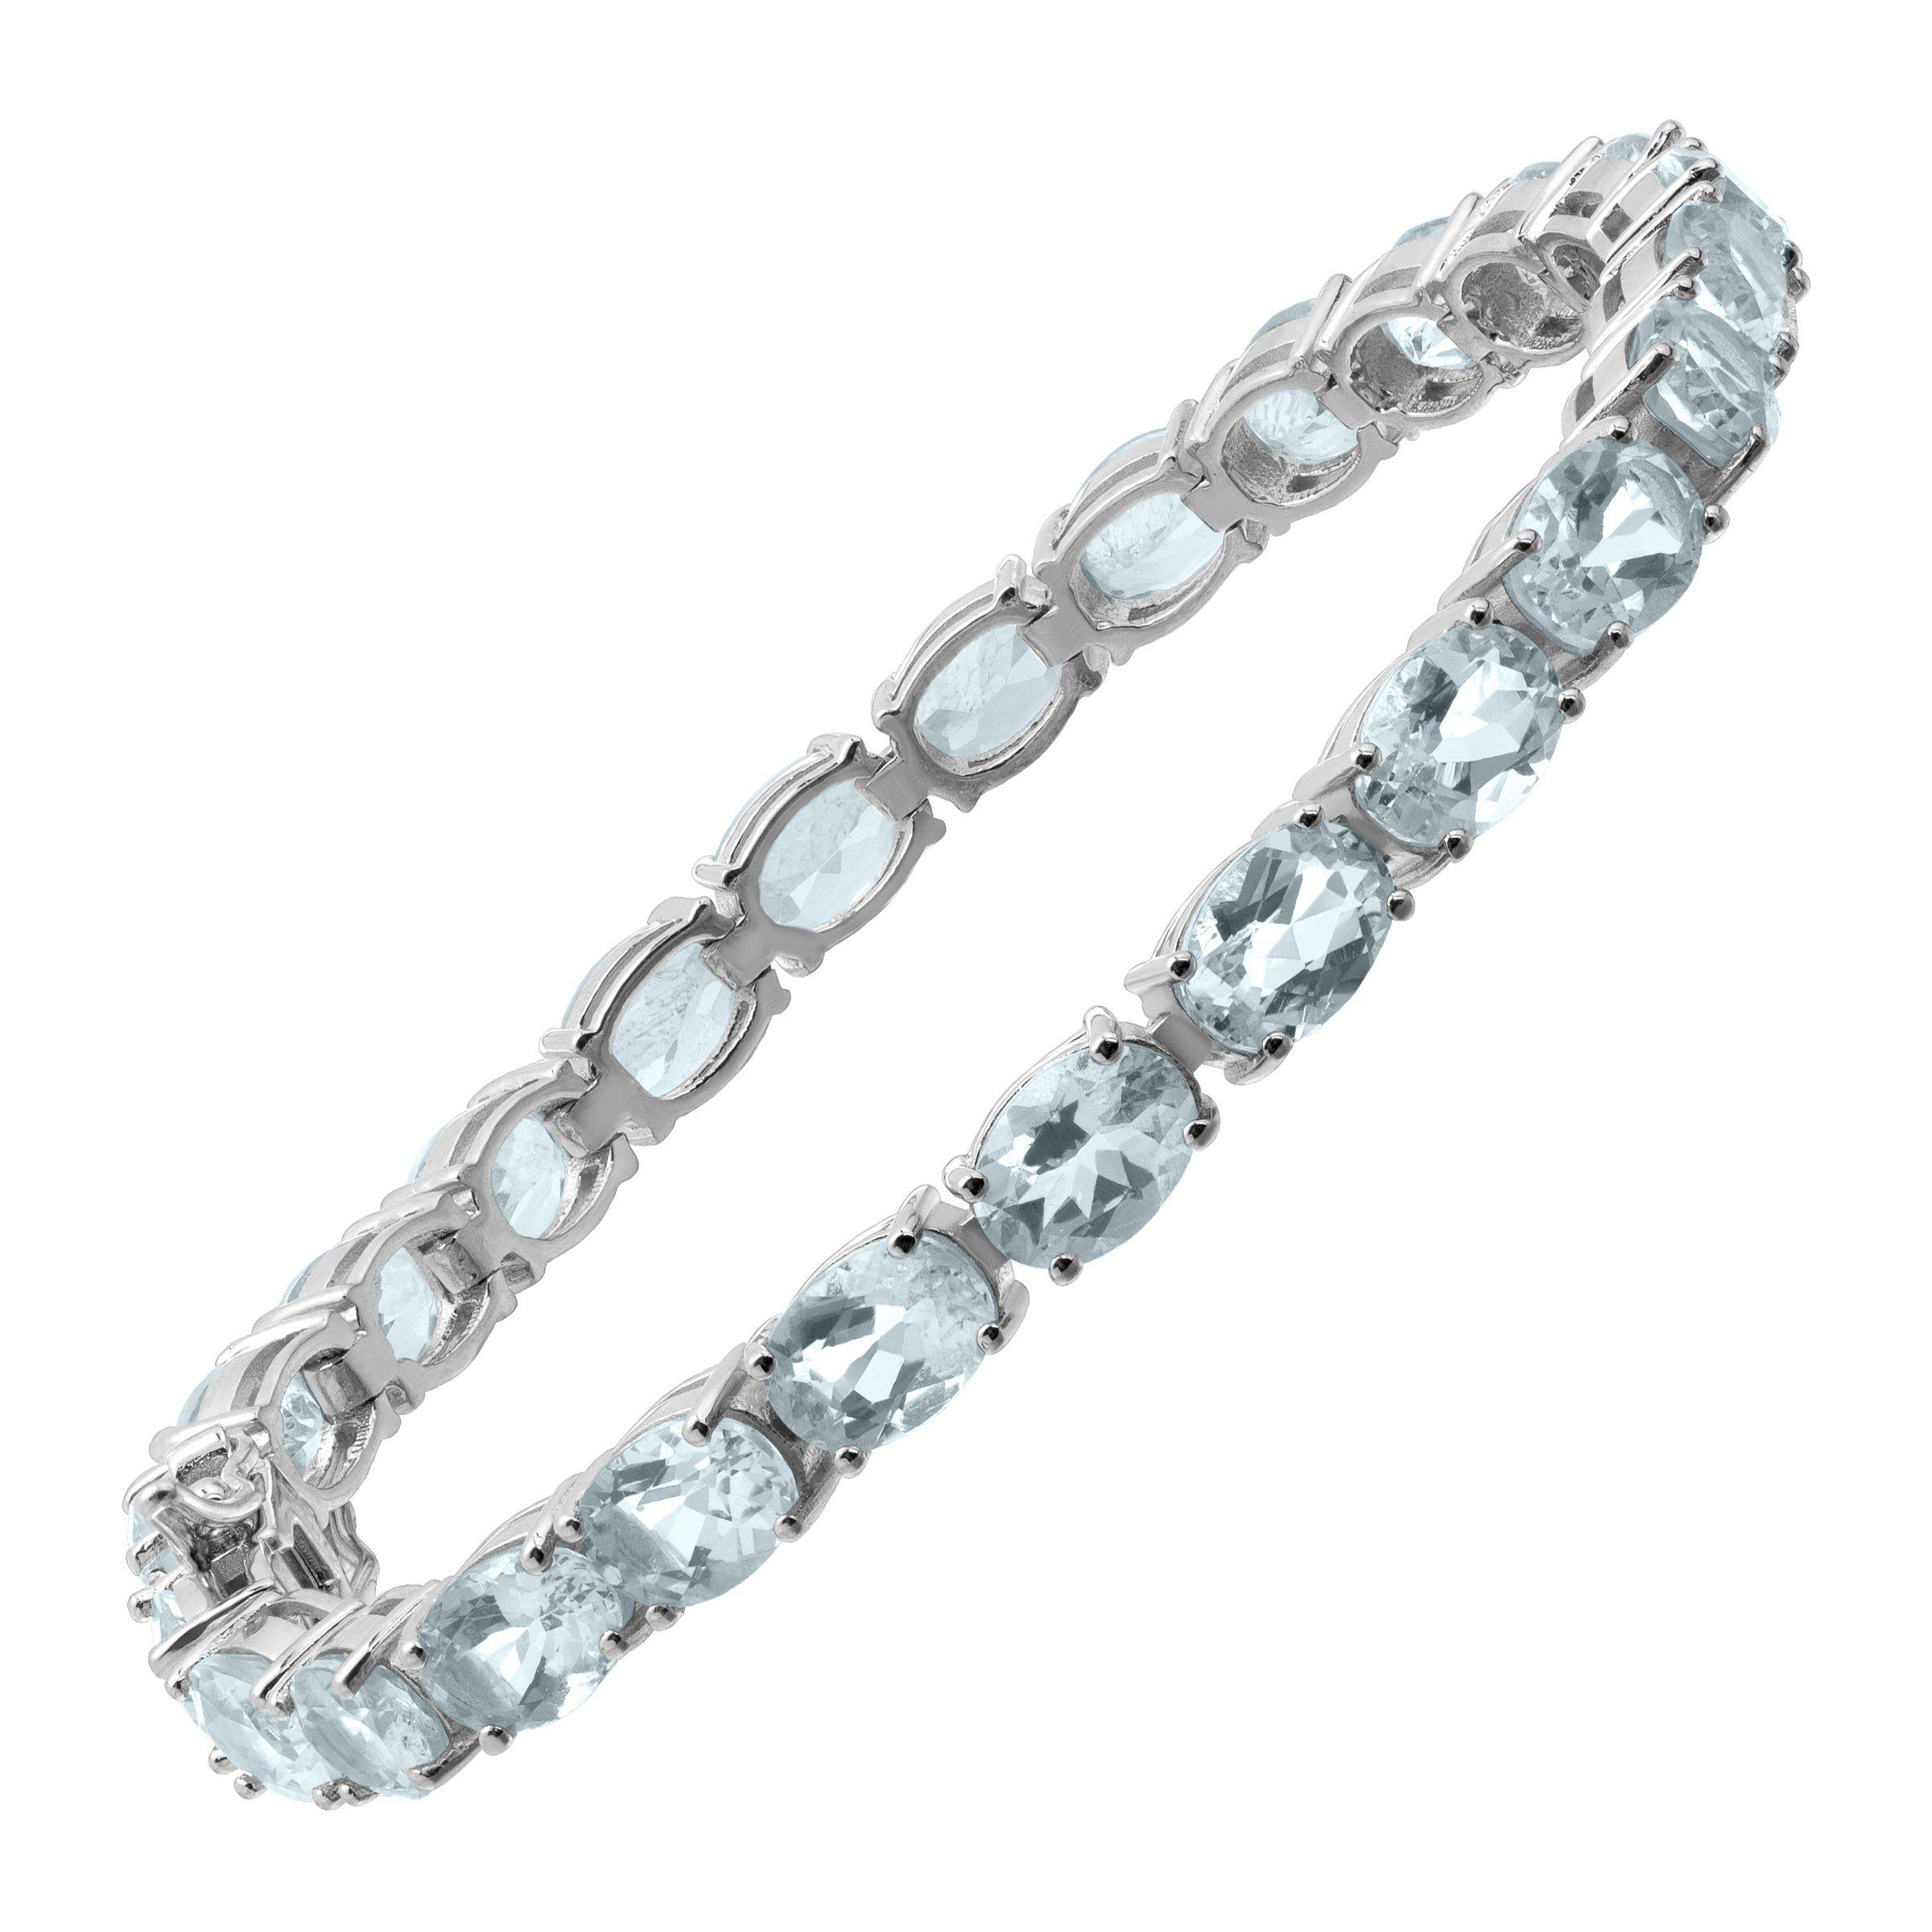 23 ct Natural Aquamarine Tennis Bracelet in Sterling Silver, 7.5''